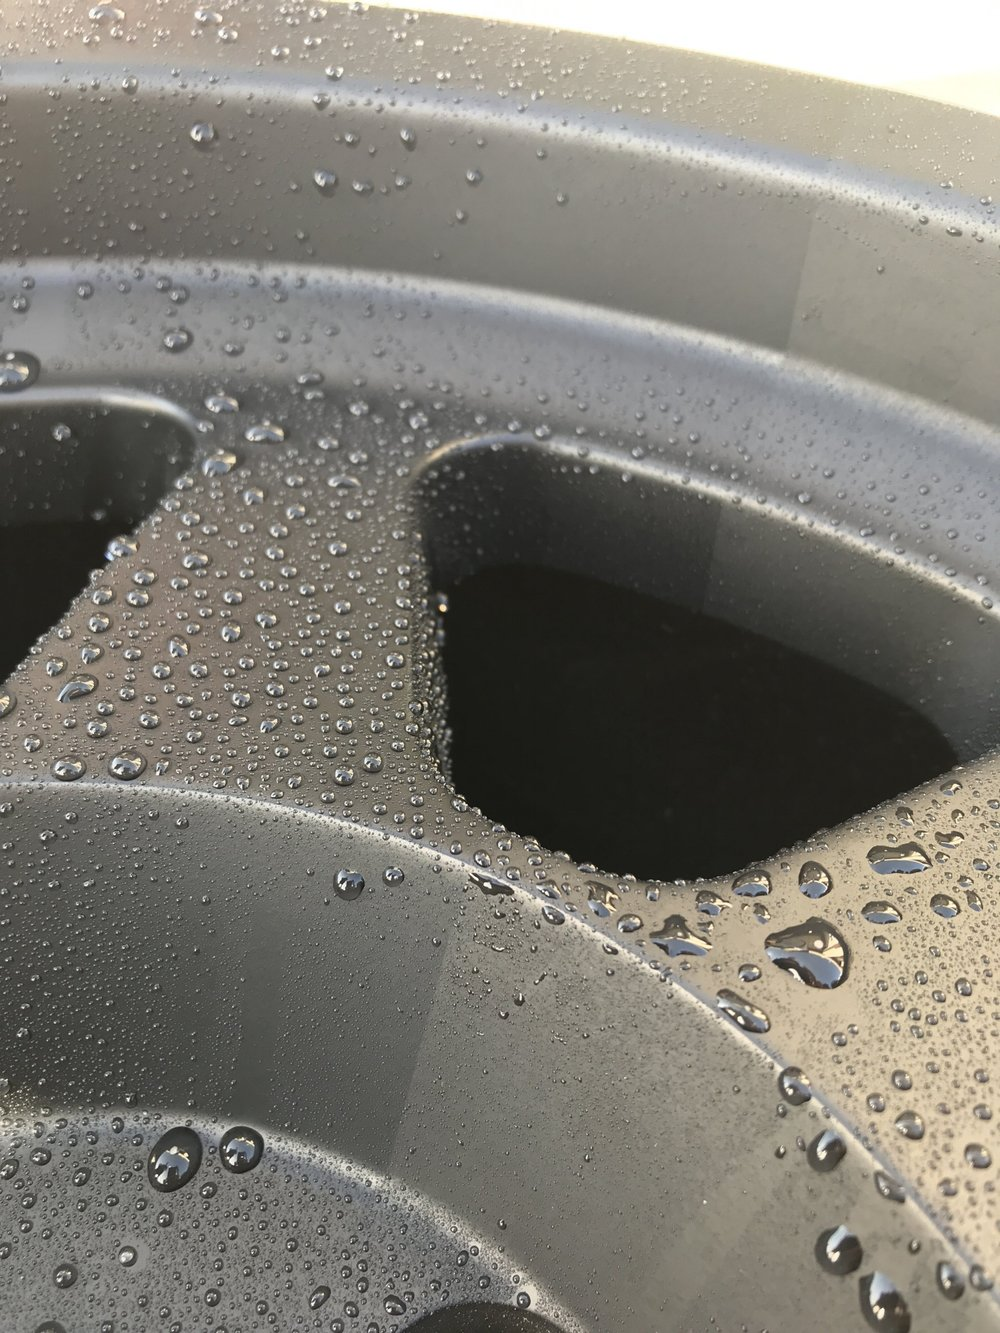 """BeadLock"" Wheel & Suspension Ceramic Coating - 50/50 Shot of wheels coated with Beadlock"